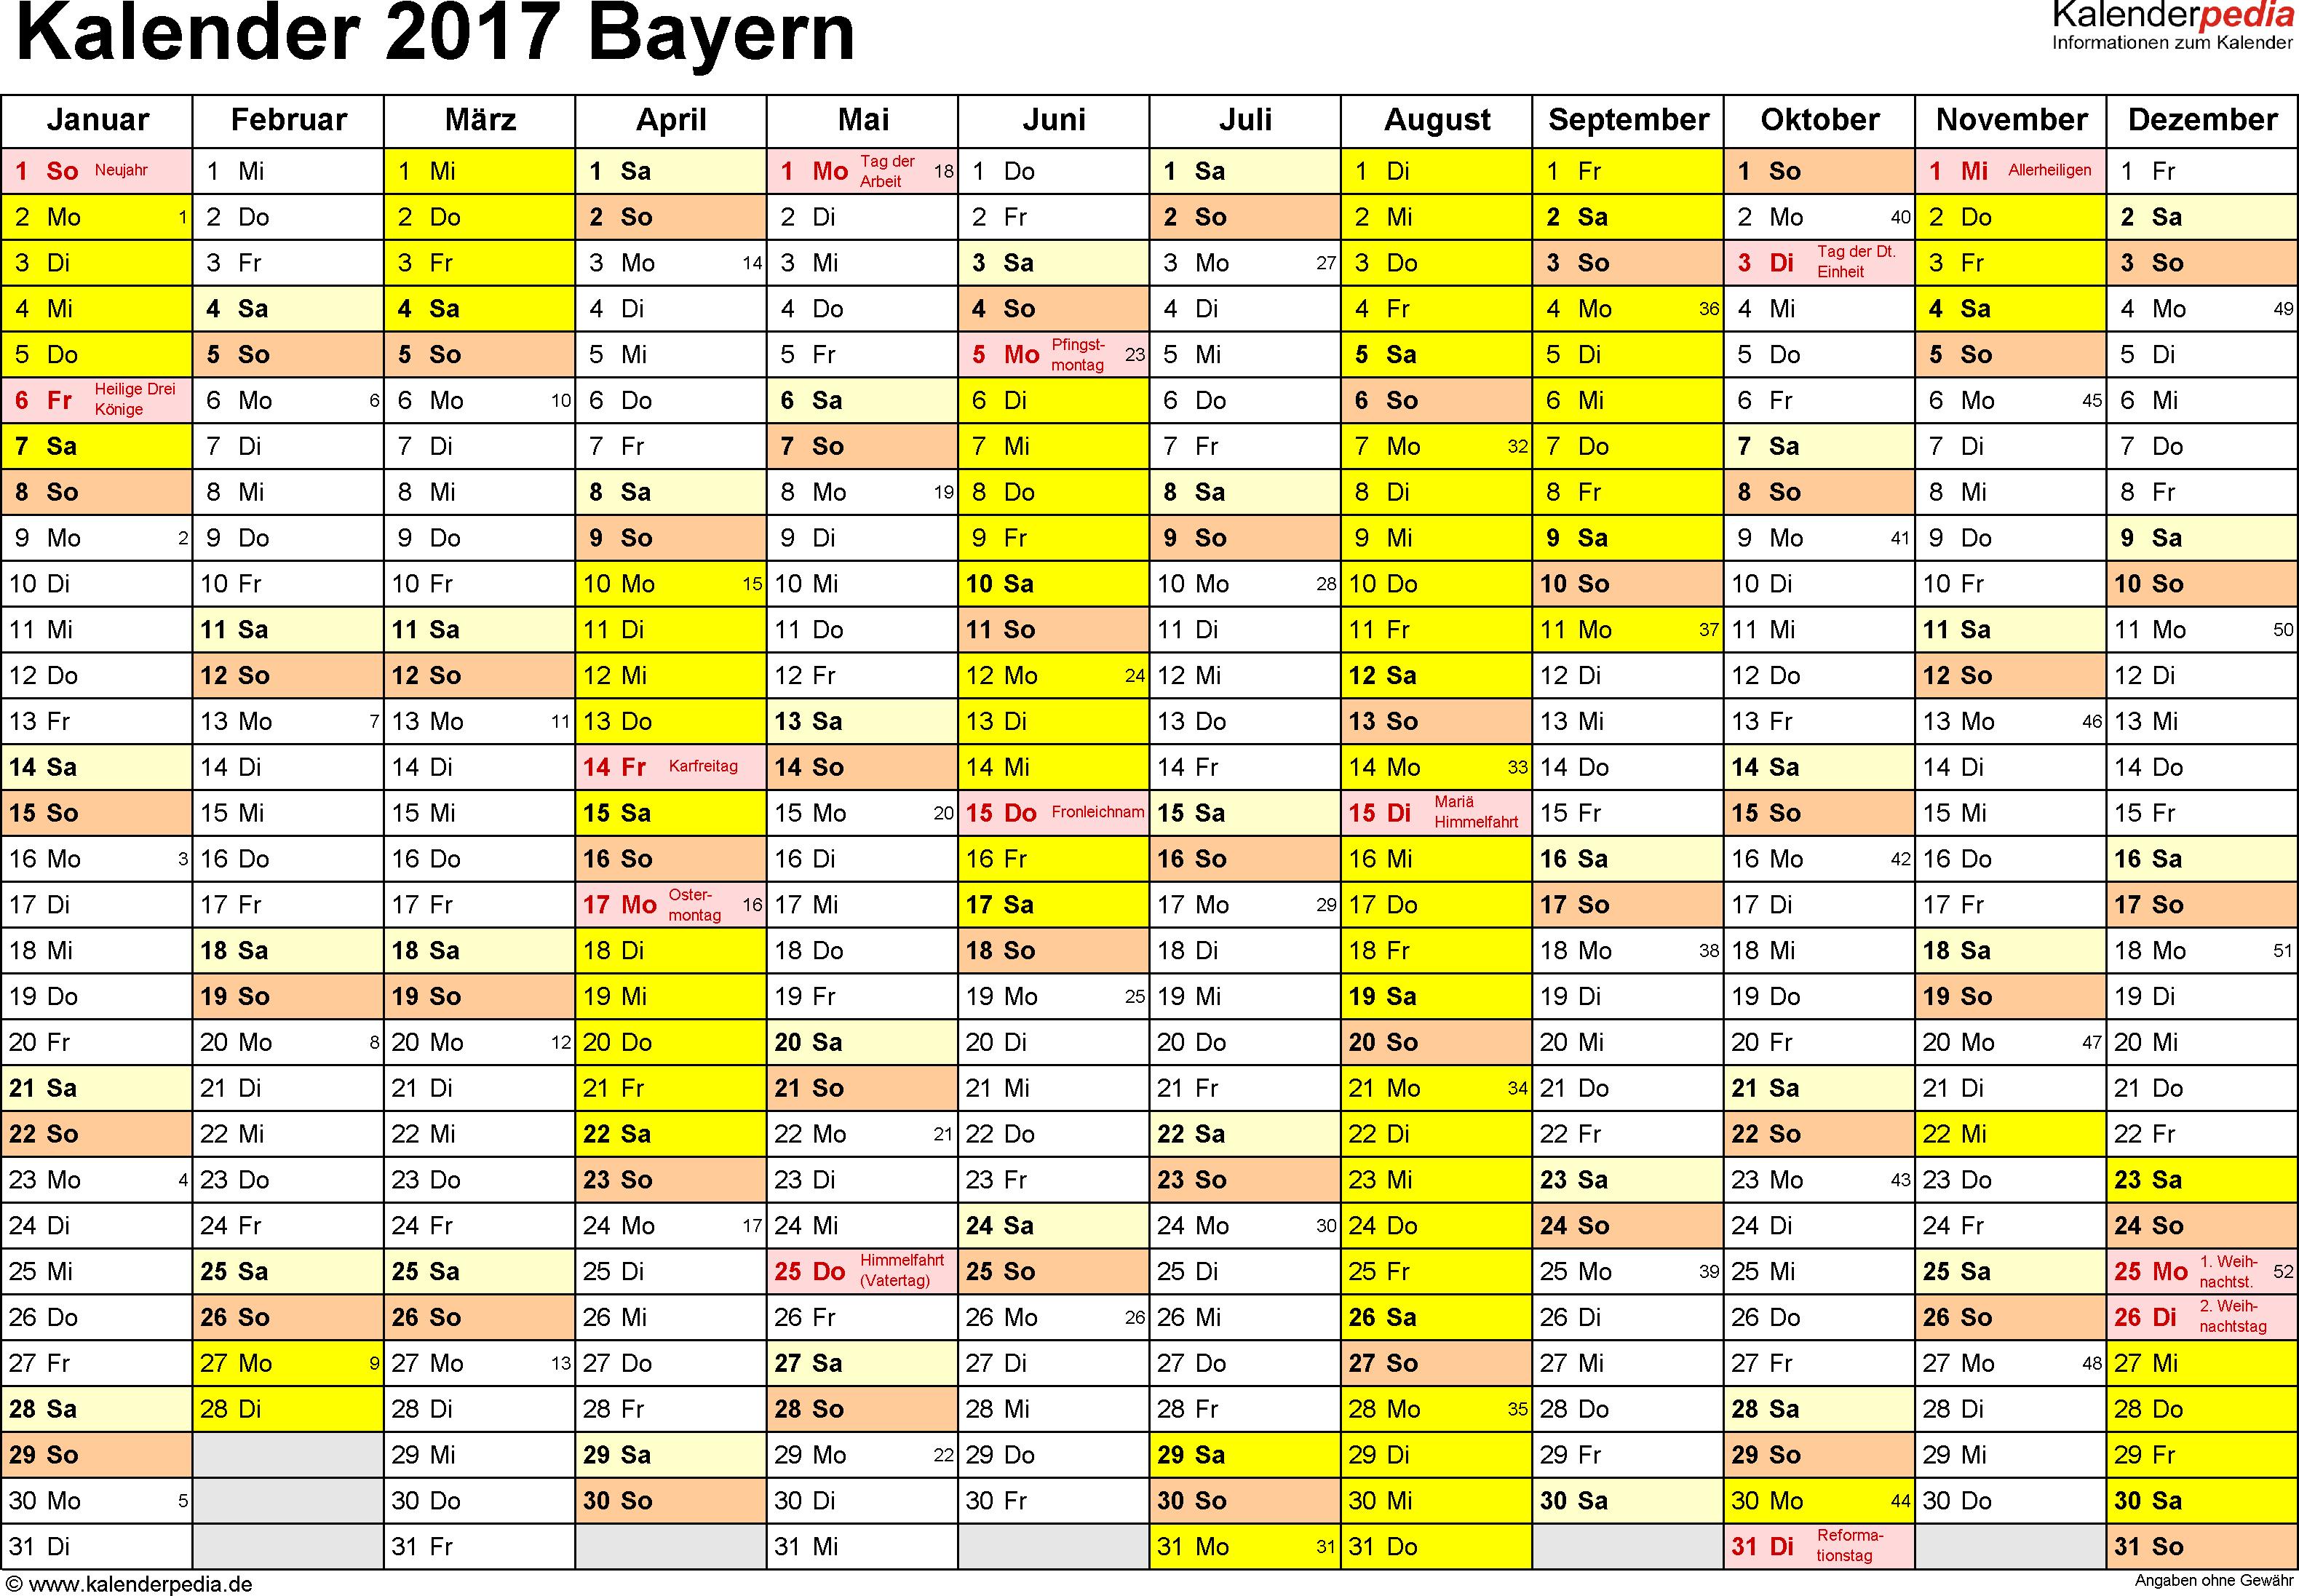 Kalender 2017 Bayern